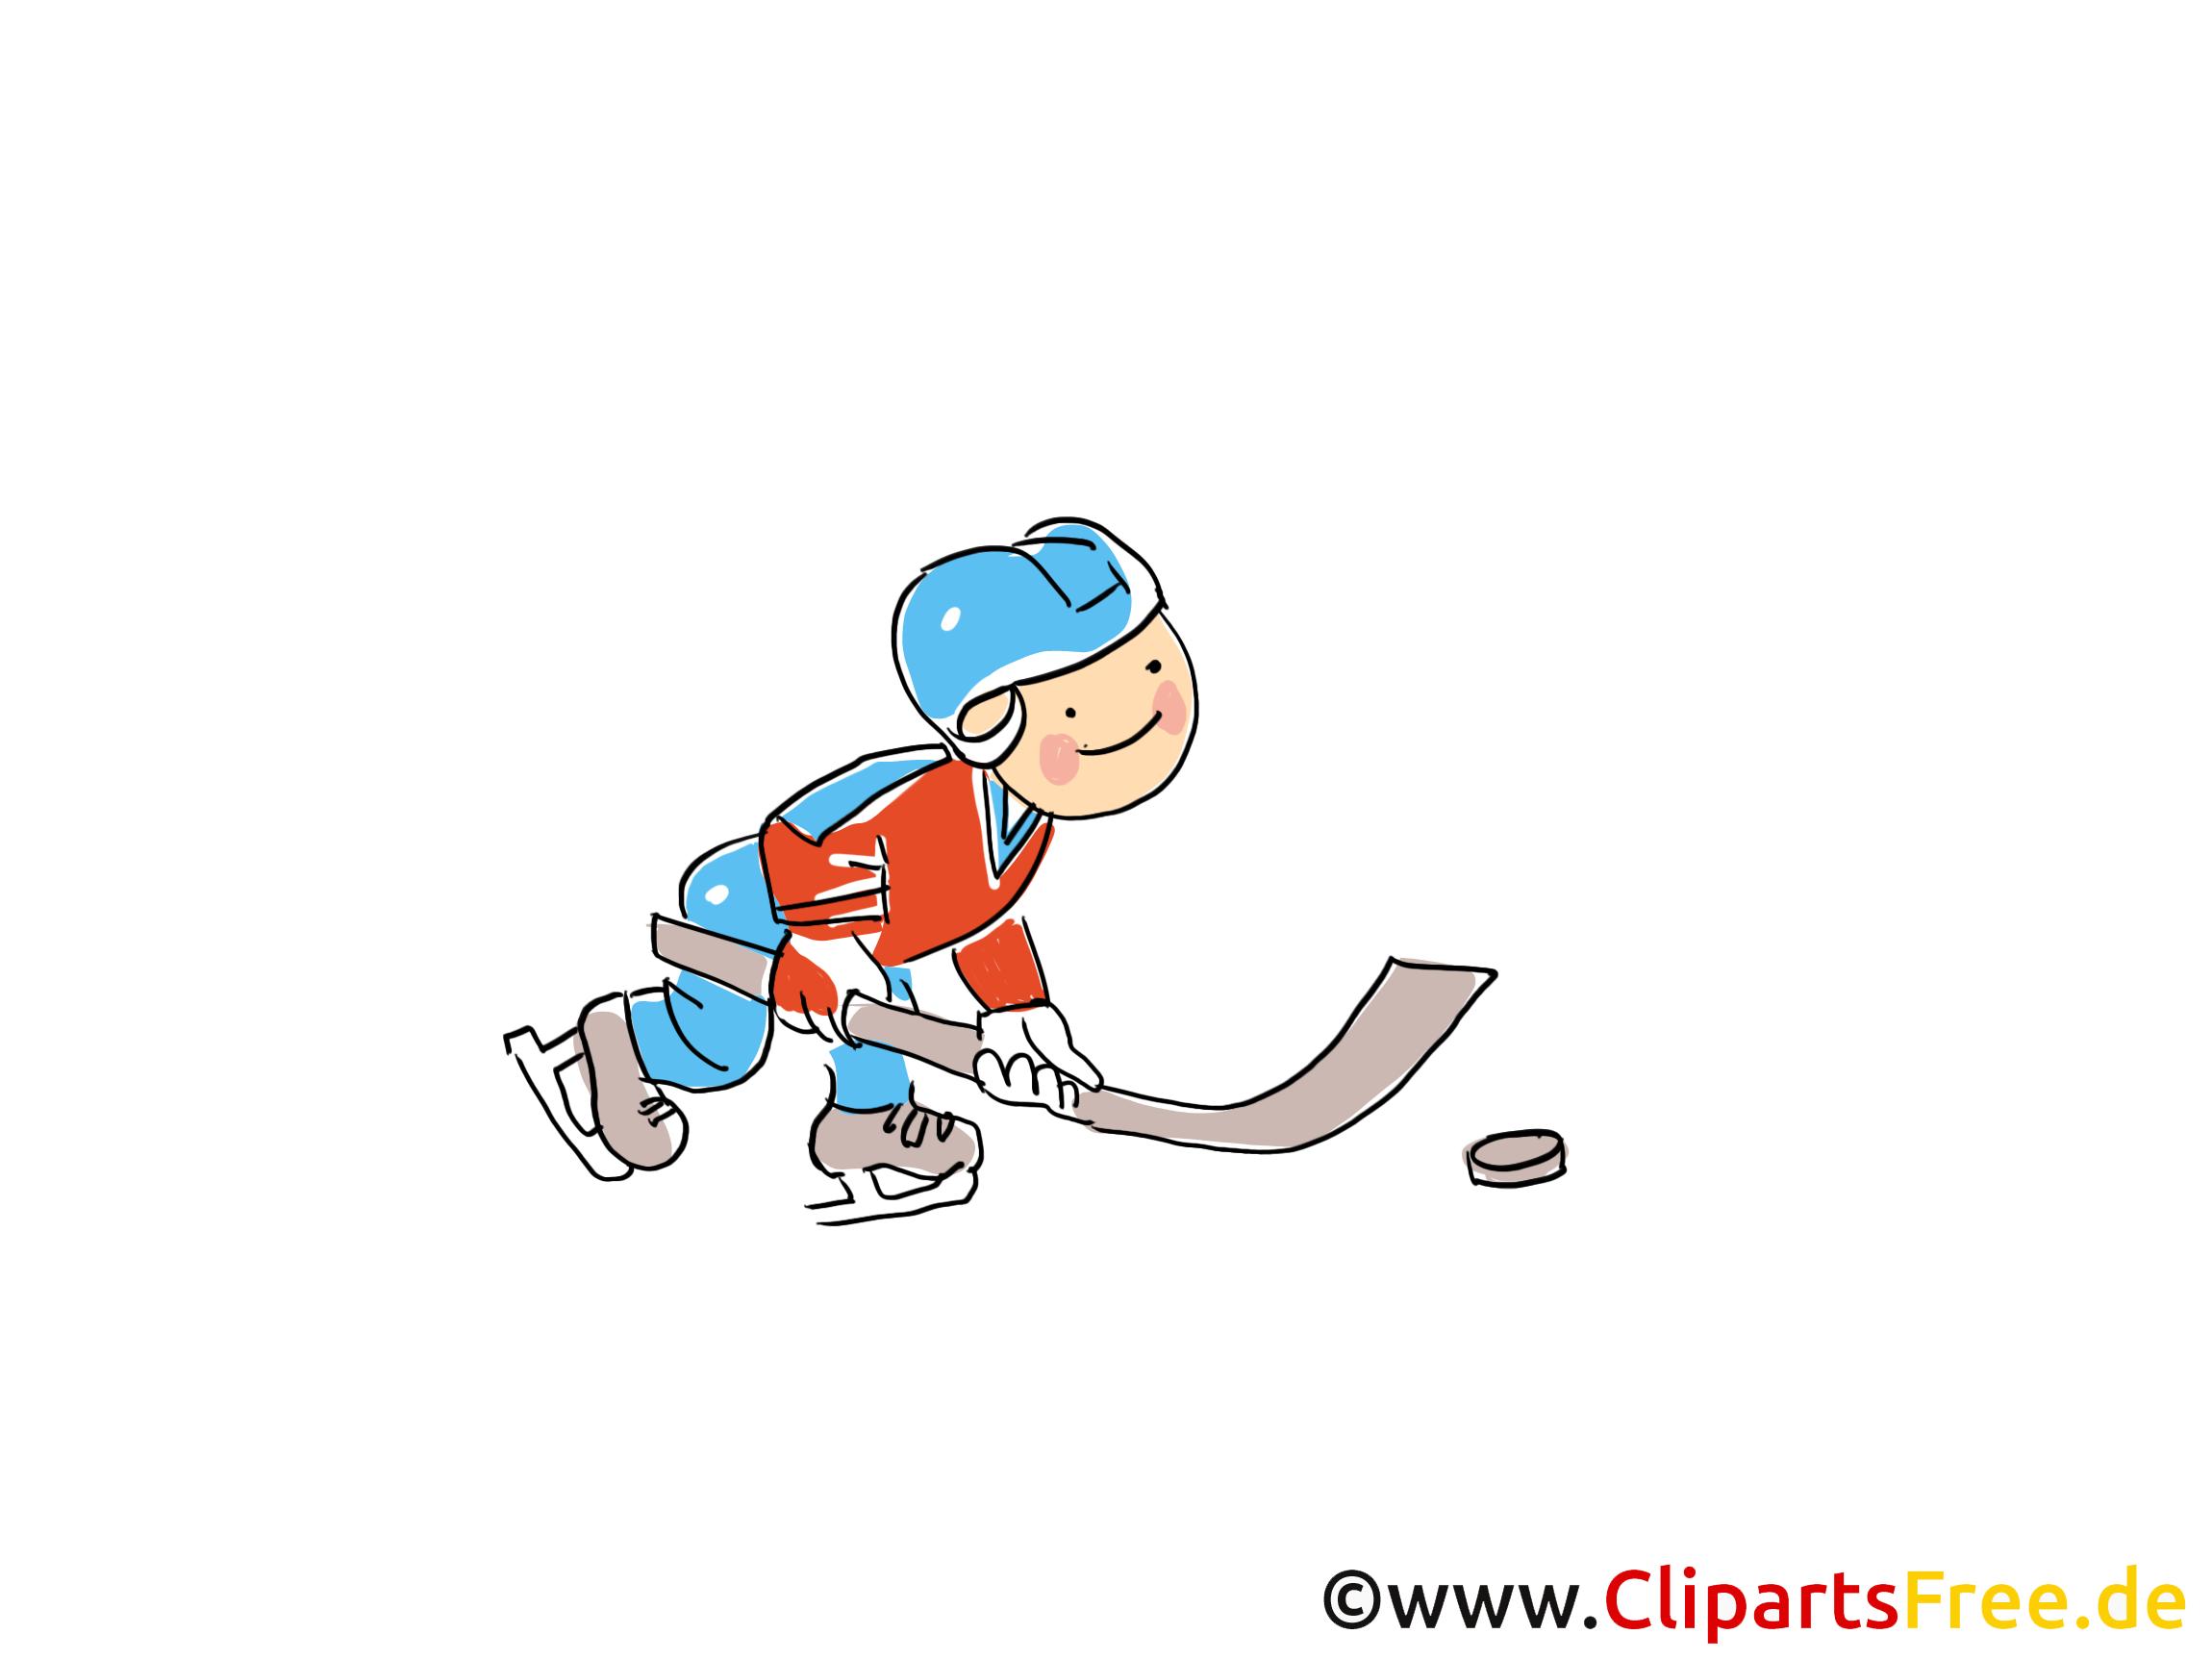 Petit hockeyeur dessins gratuits - Hockey clipart